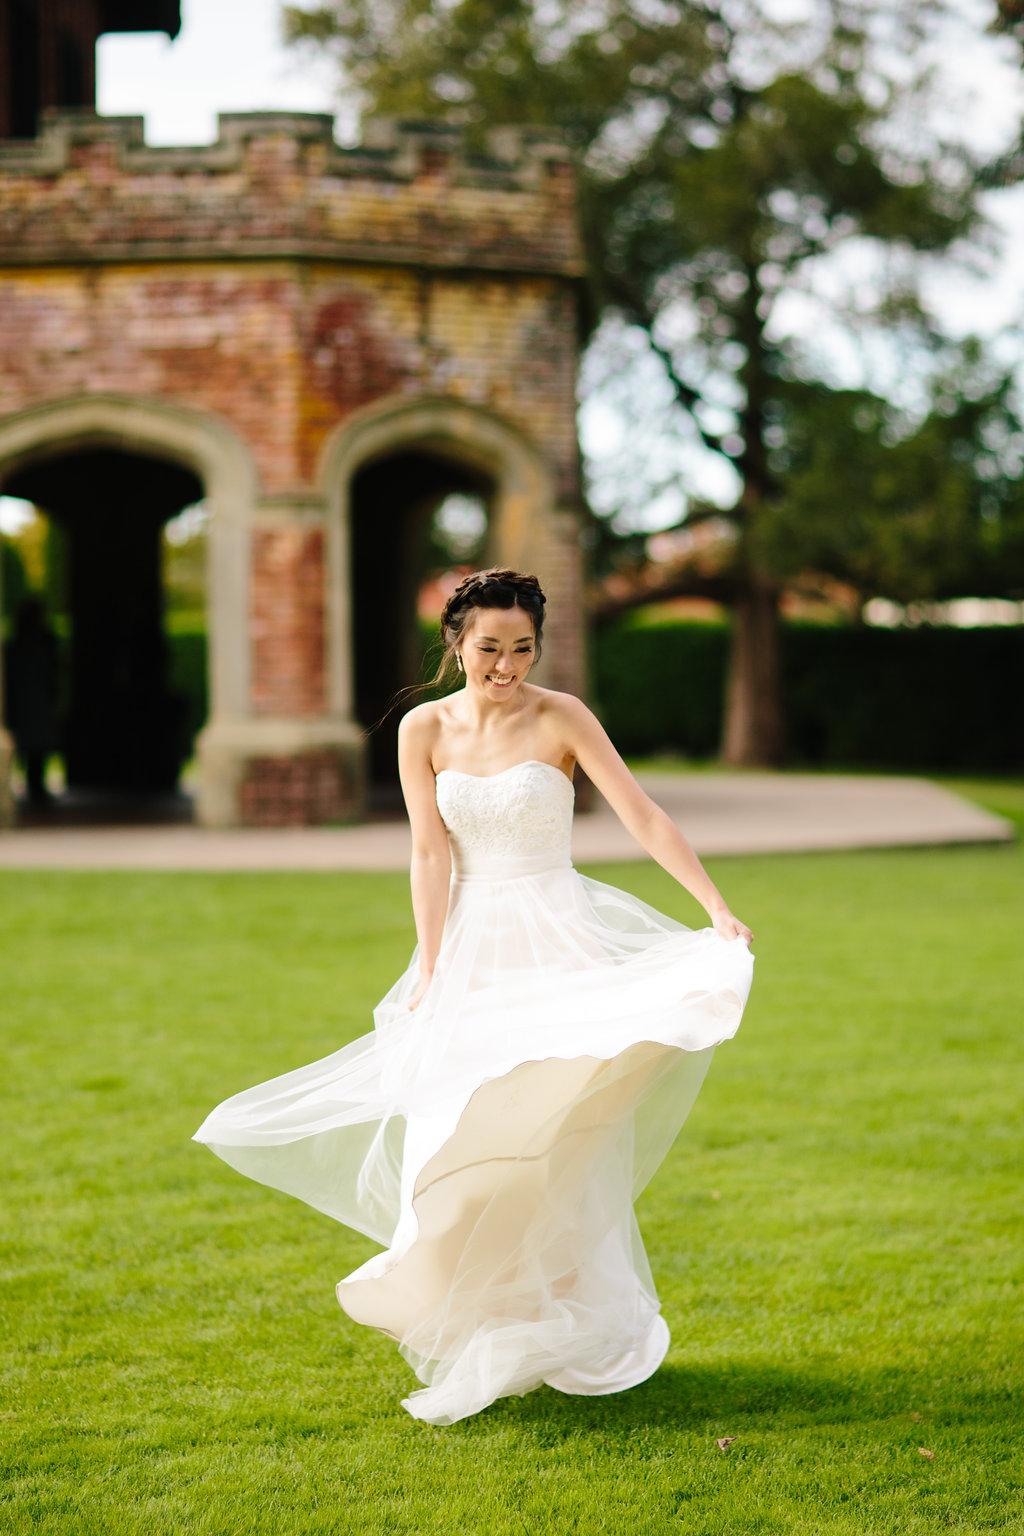 Kellylemonphotography_lucy+kento_weddingpreviews-45.jpg